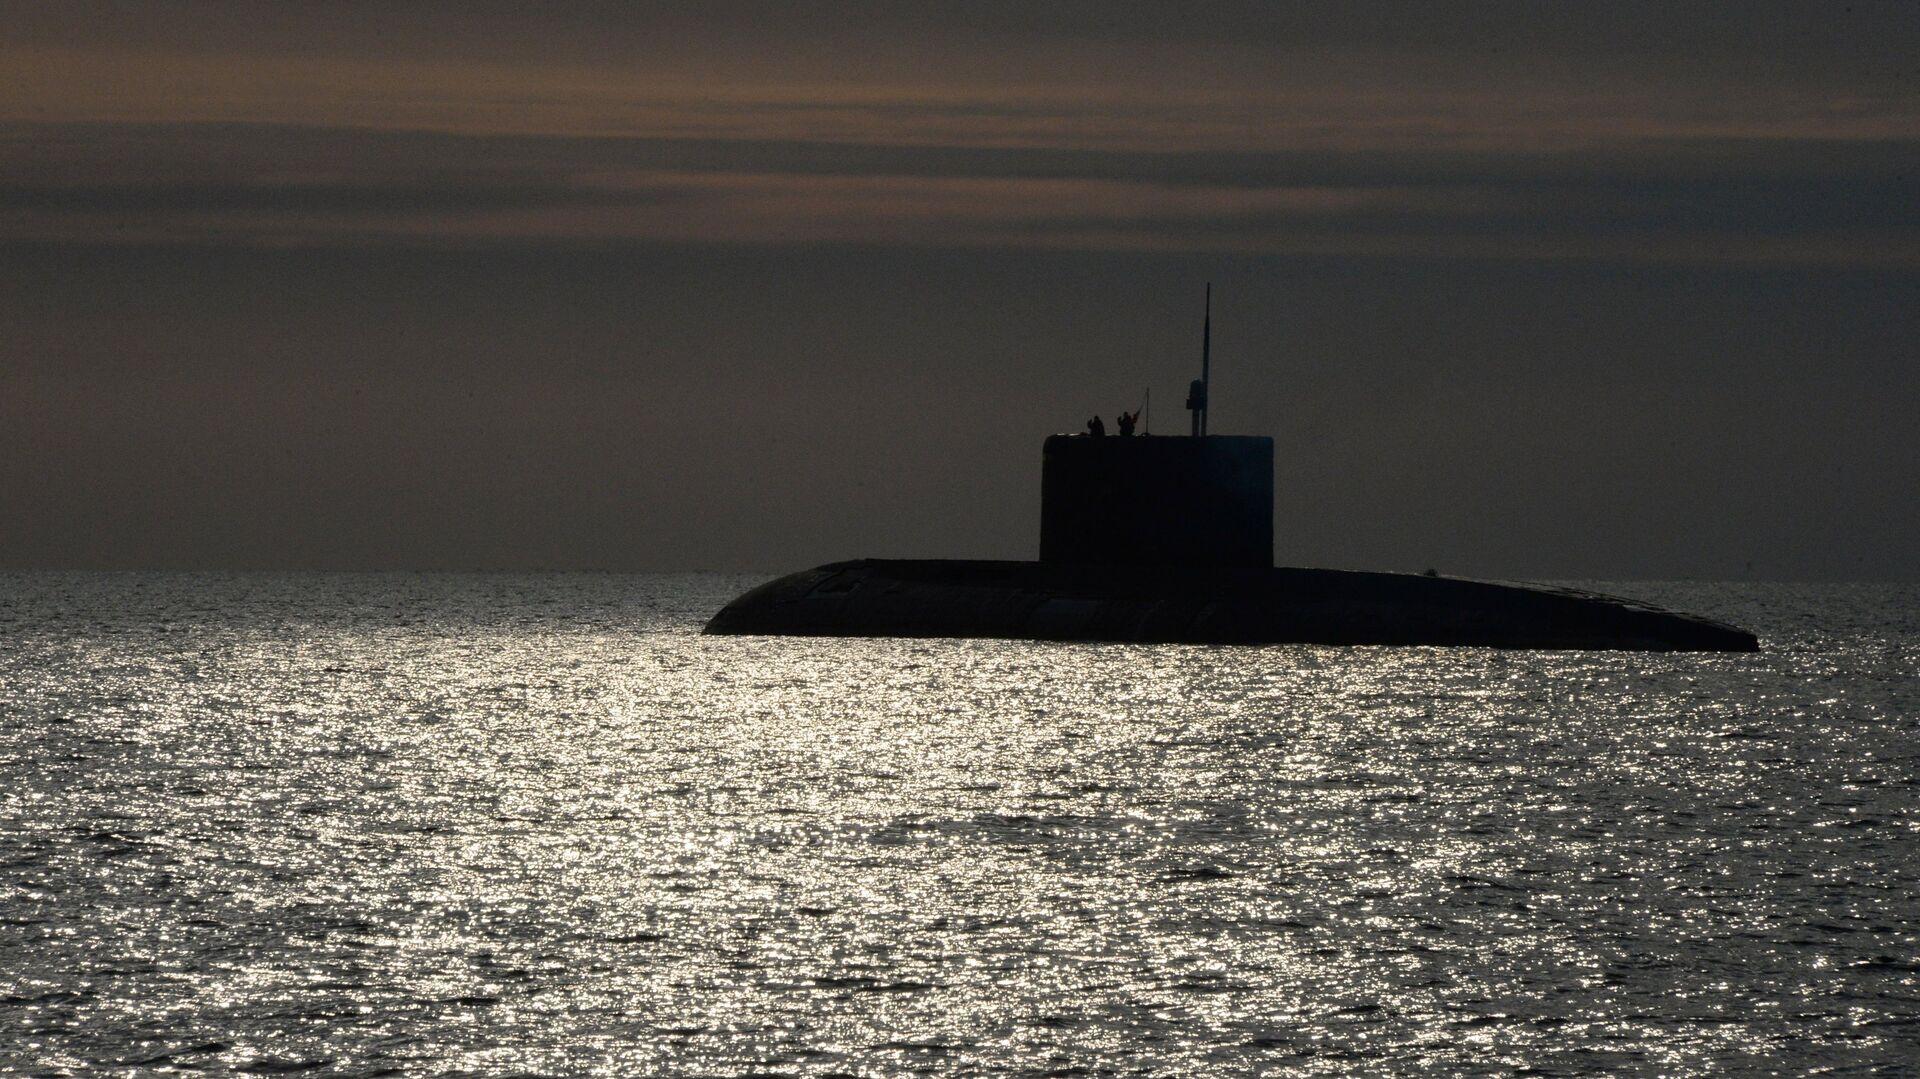 Un submarino (imagen referencial) - Sputnik Mundo, 1920, 01.10.2021